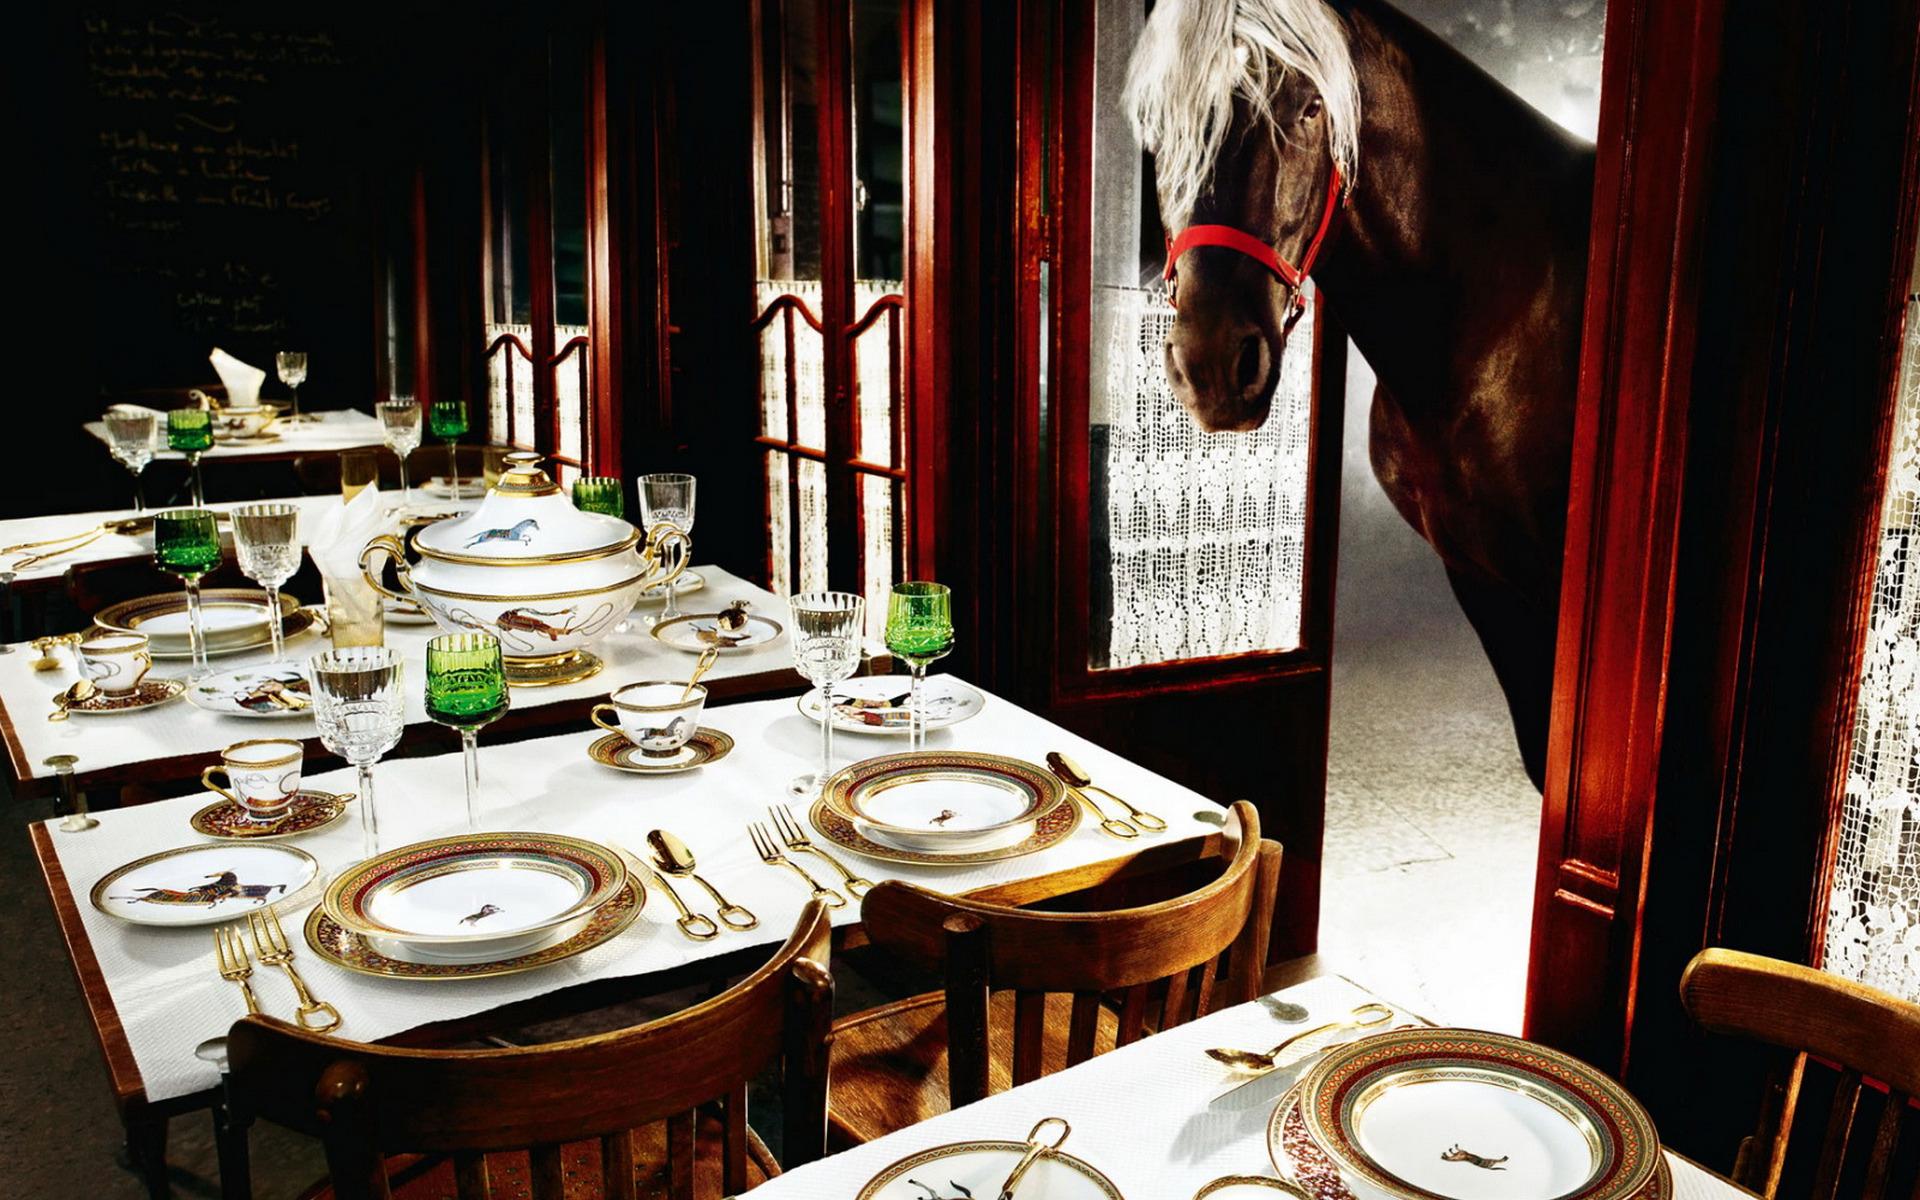 обои конь, морда, грива, столы картинки фото